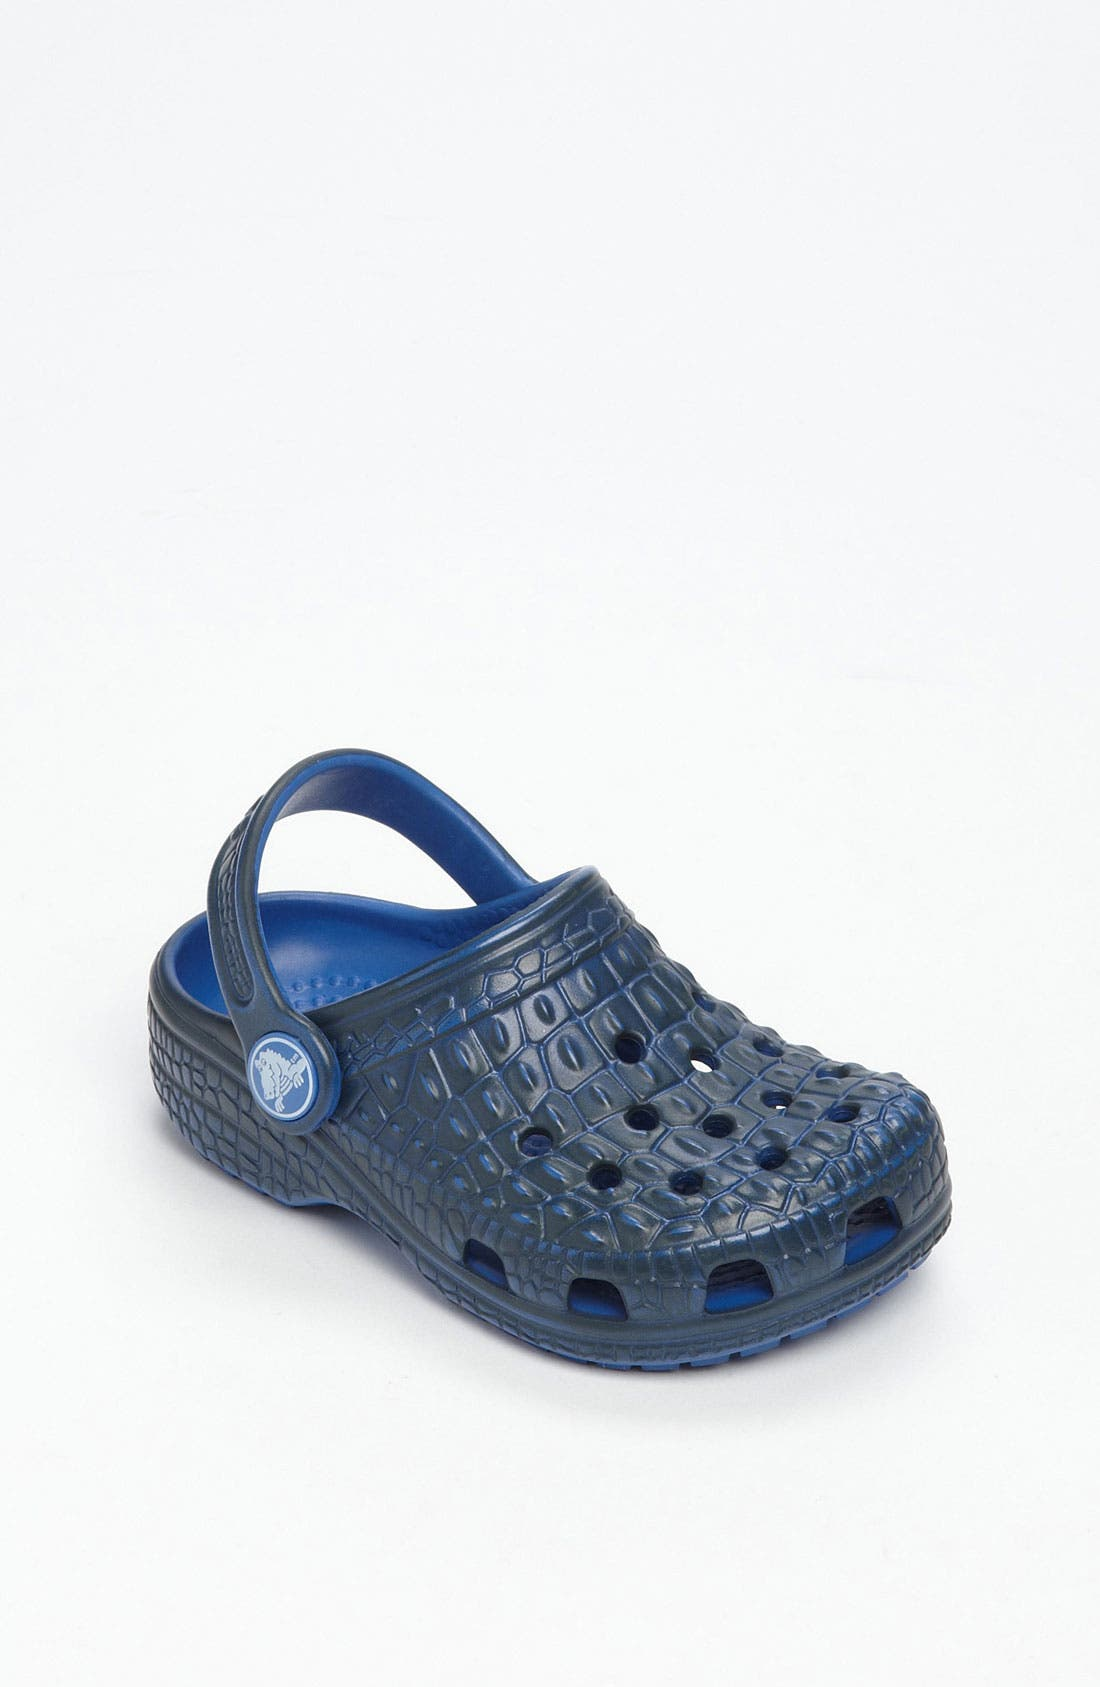 Alternate Image 1 Selected - CROCS™ 'Crocskin' Slip-On (Walker, Toddler & Little Kid)